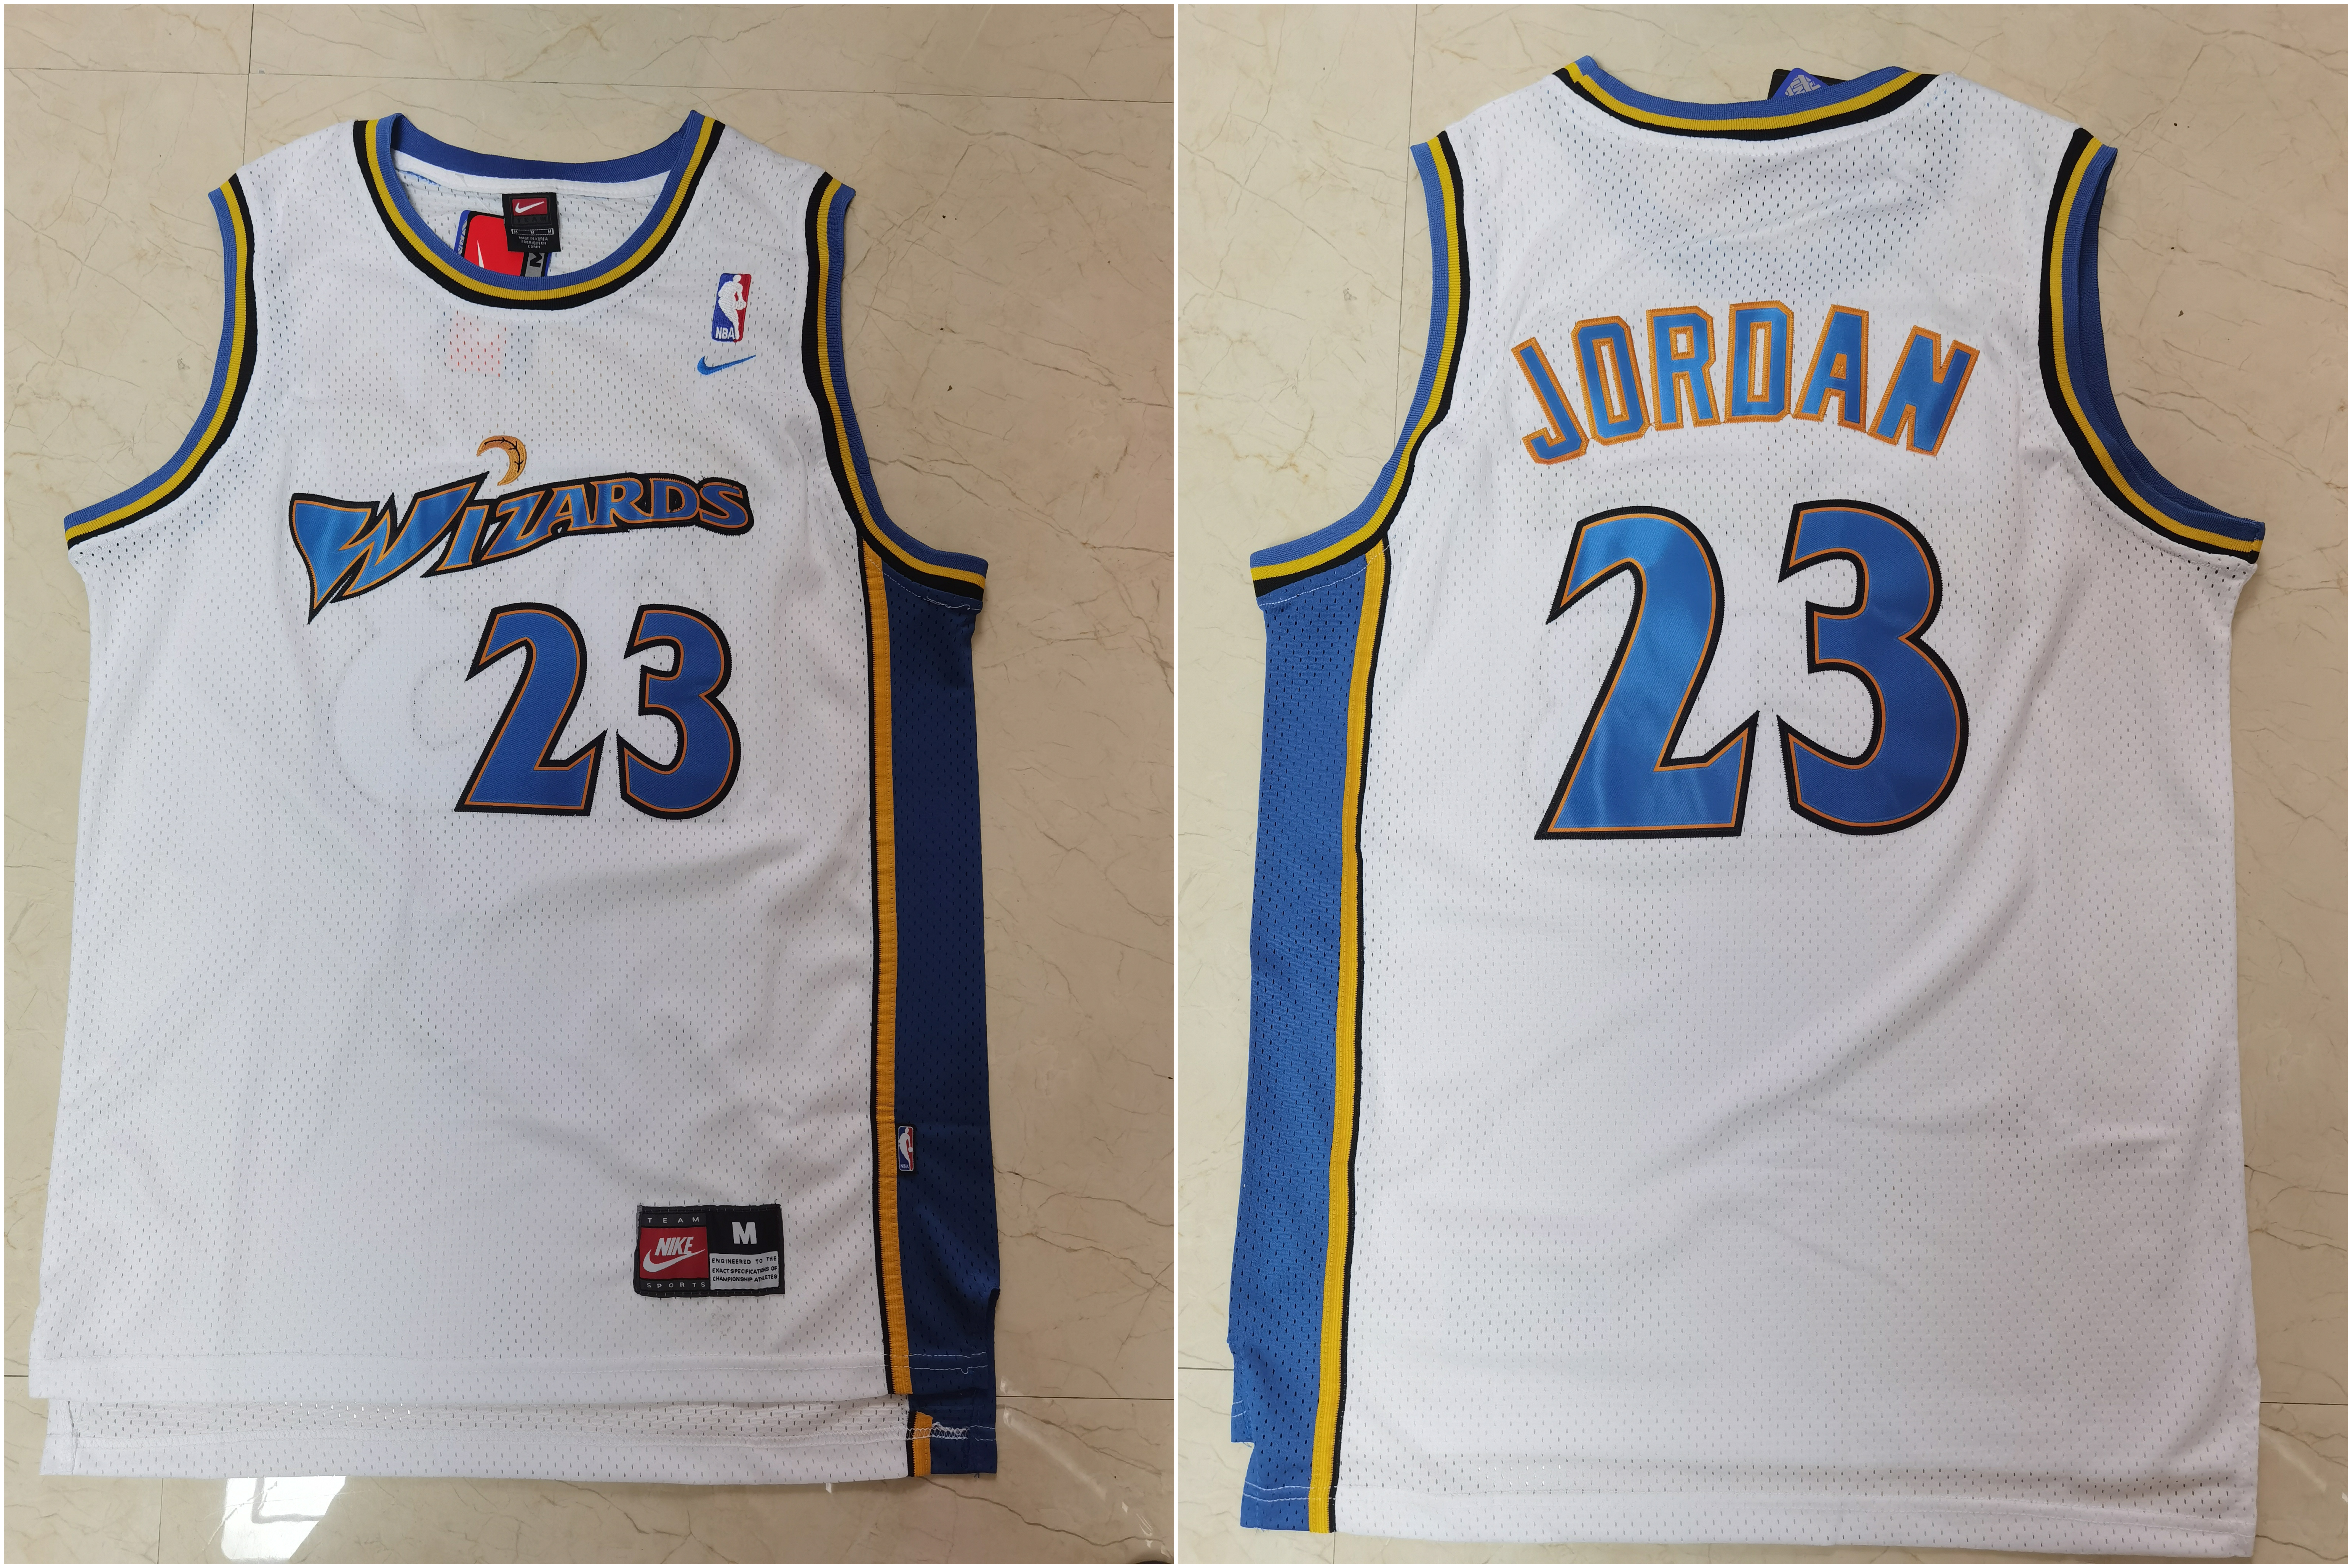 Wizards 23 Michael Jordan White Nike Swingman Jersey